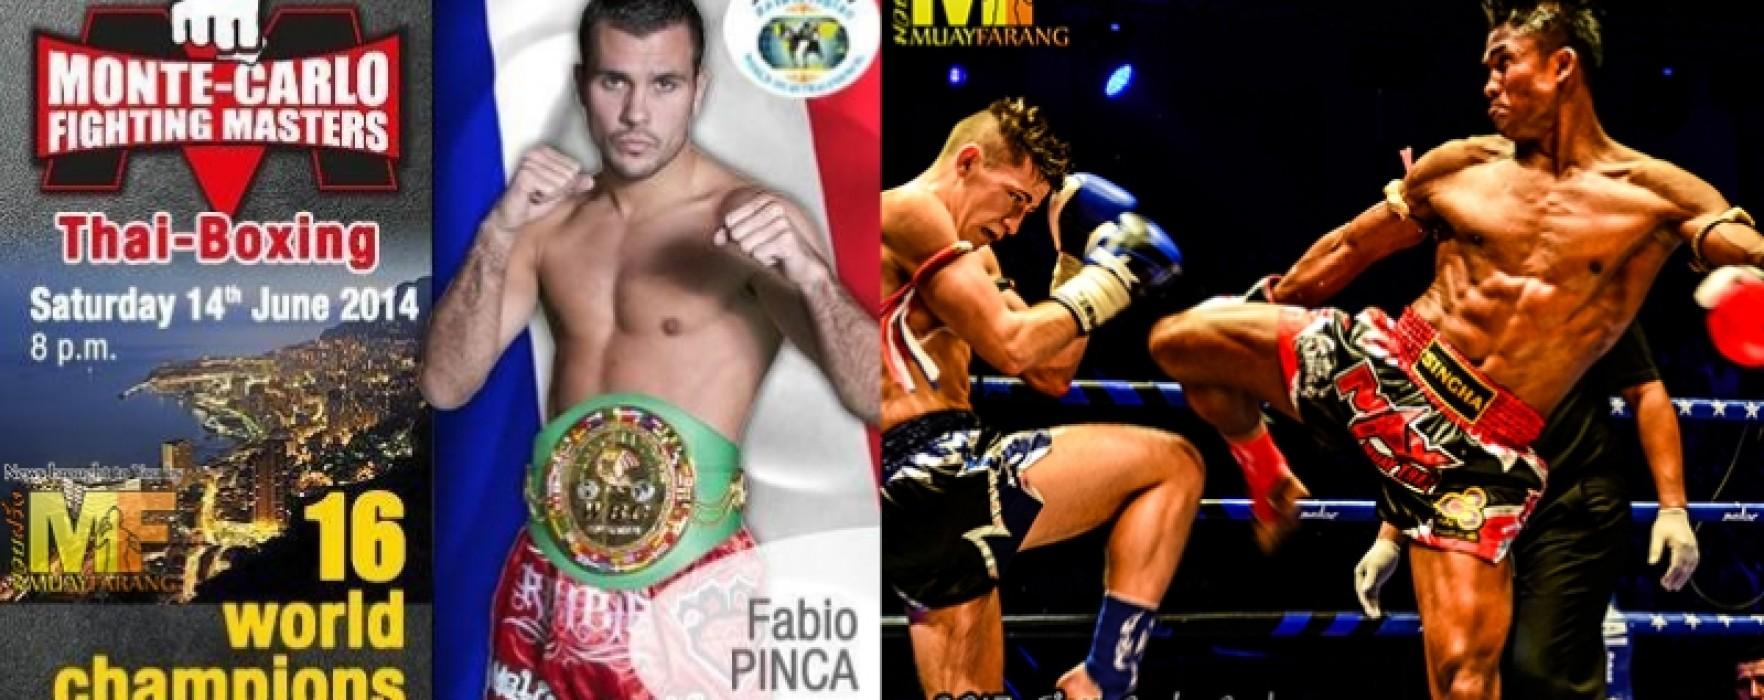 buakaw vs fabio pinca a montecarlo fighting masters june